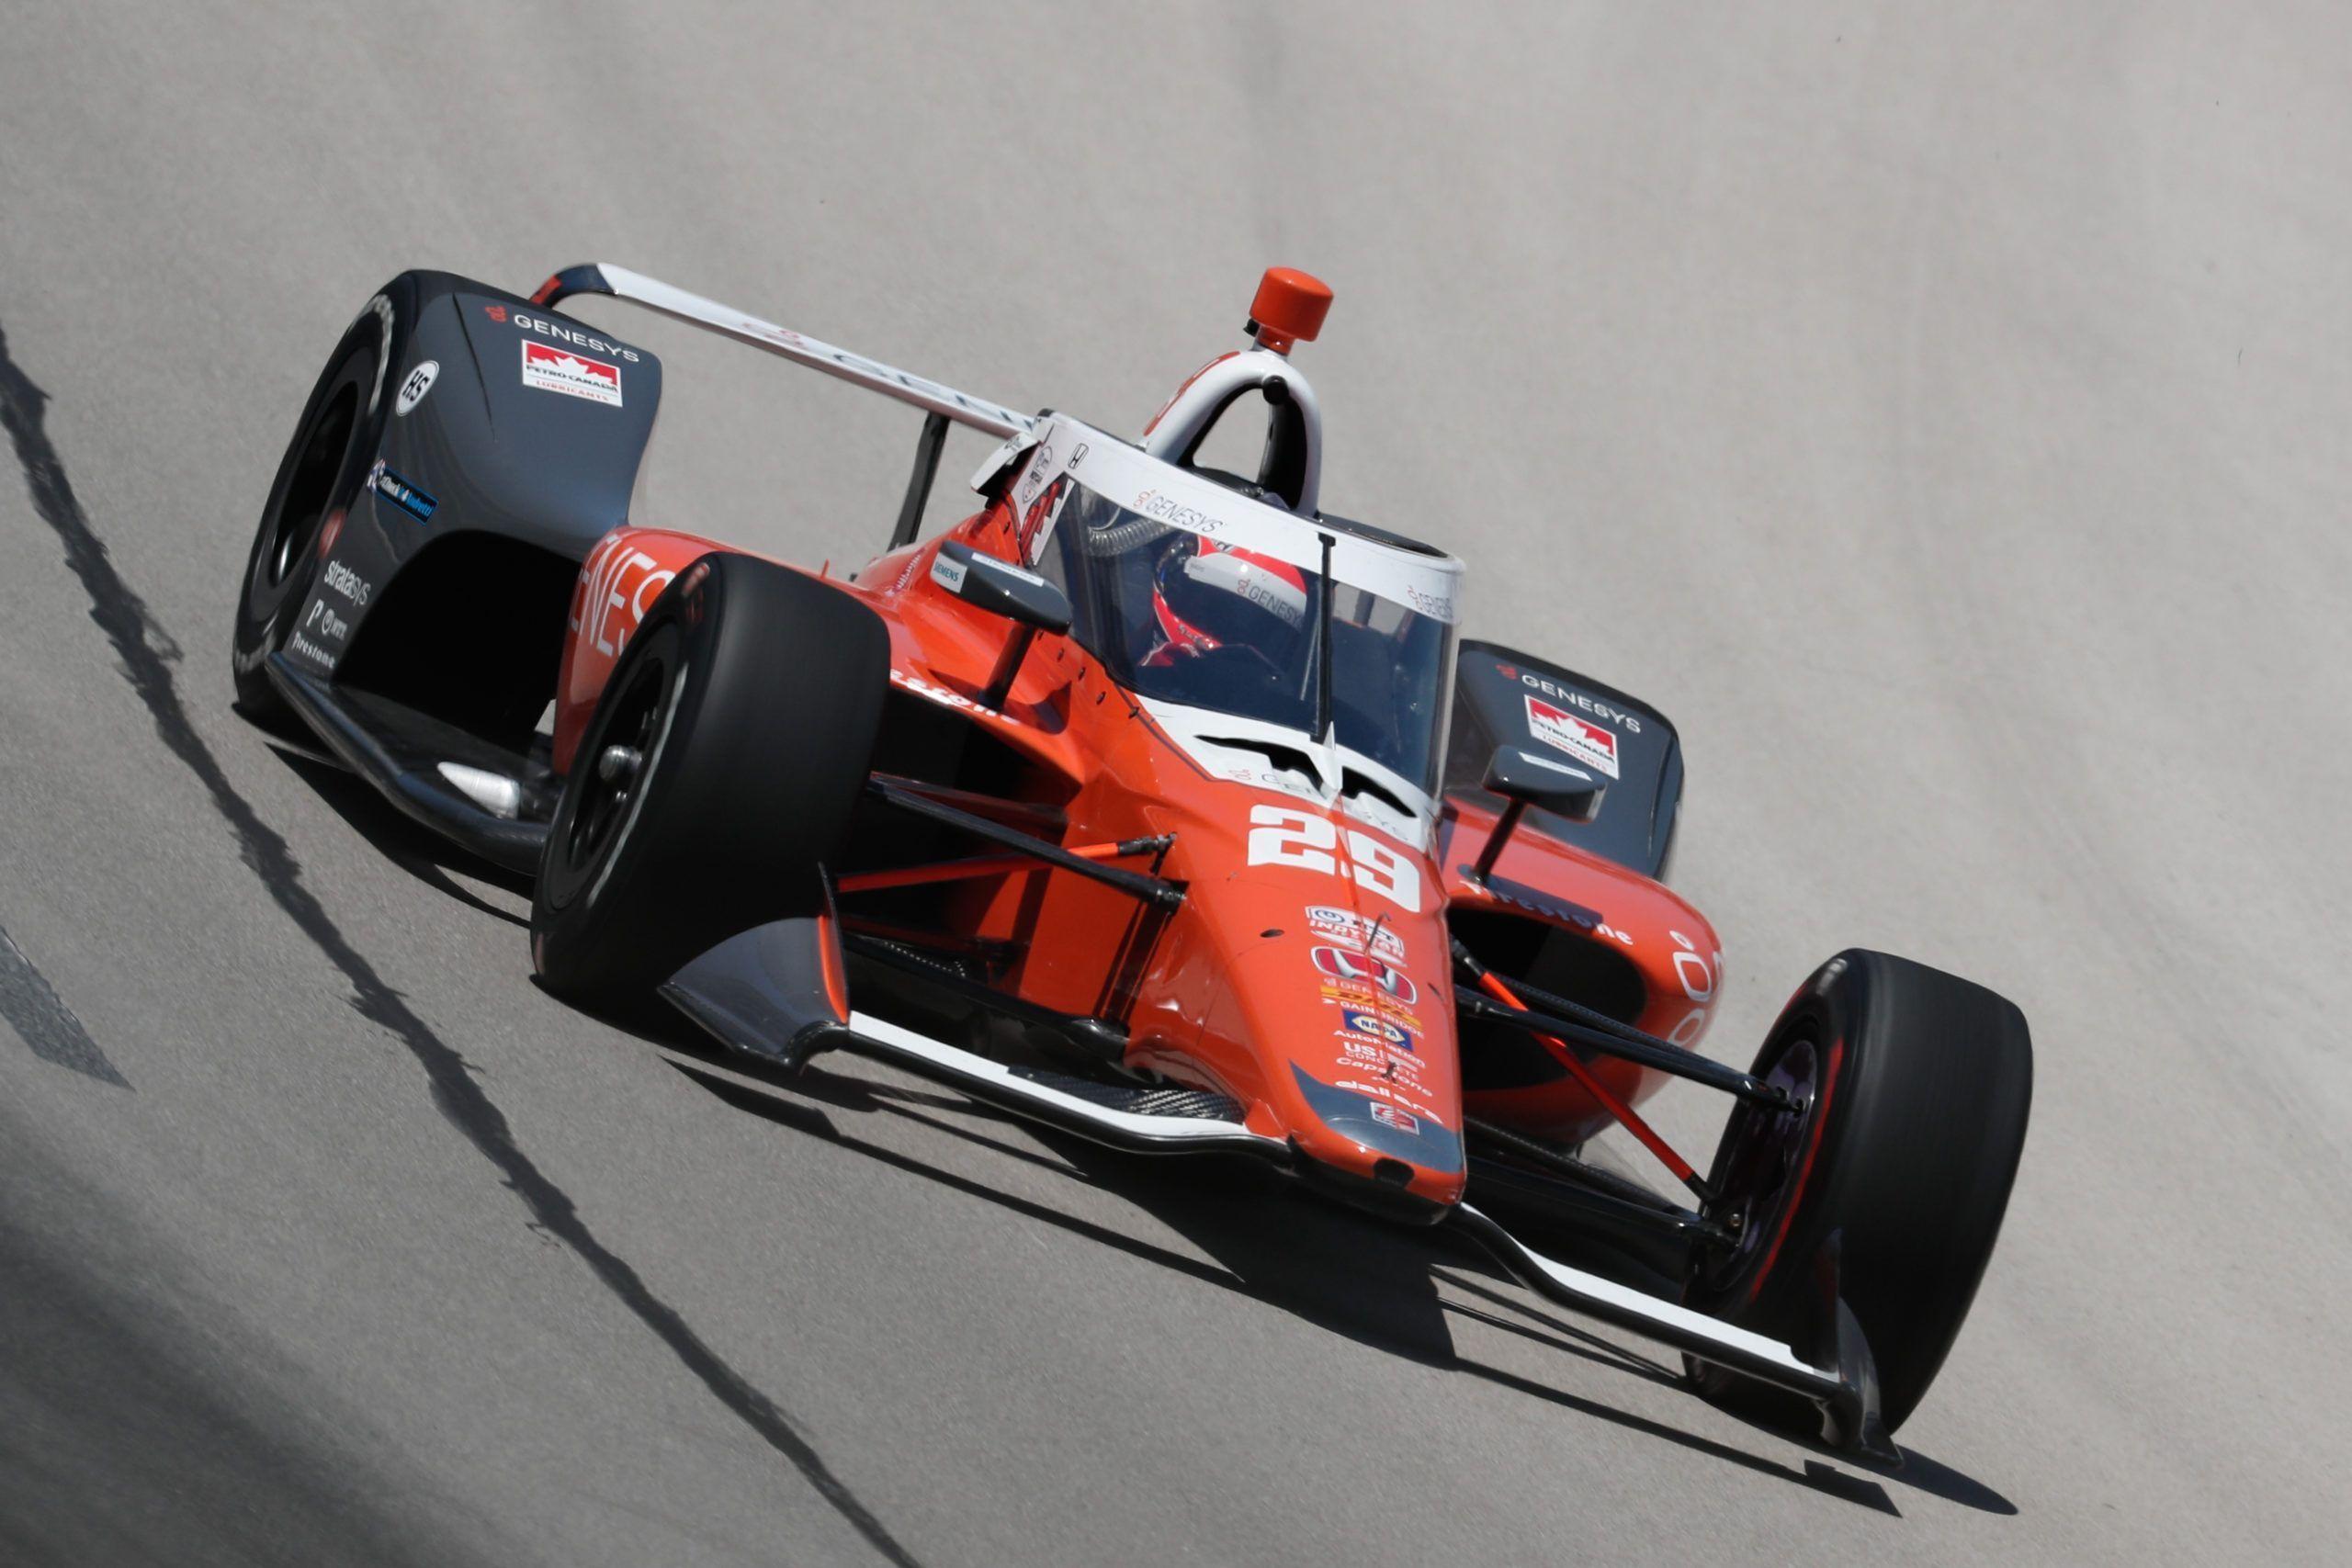 James Hinchcliffe, Andretti Autosport, IndyCar 2020